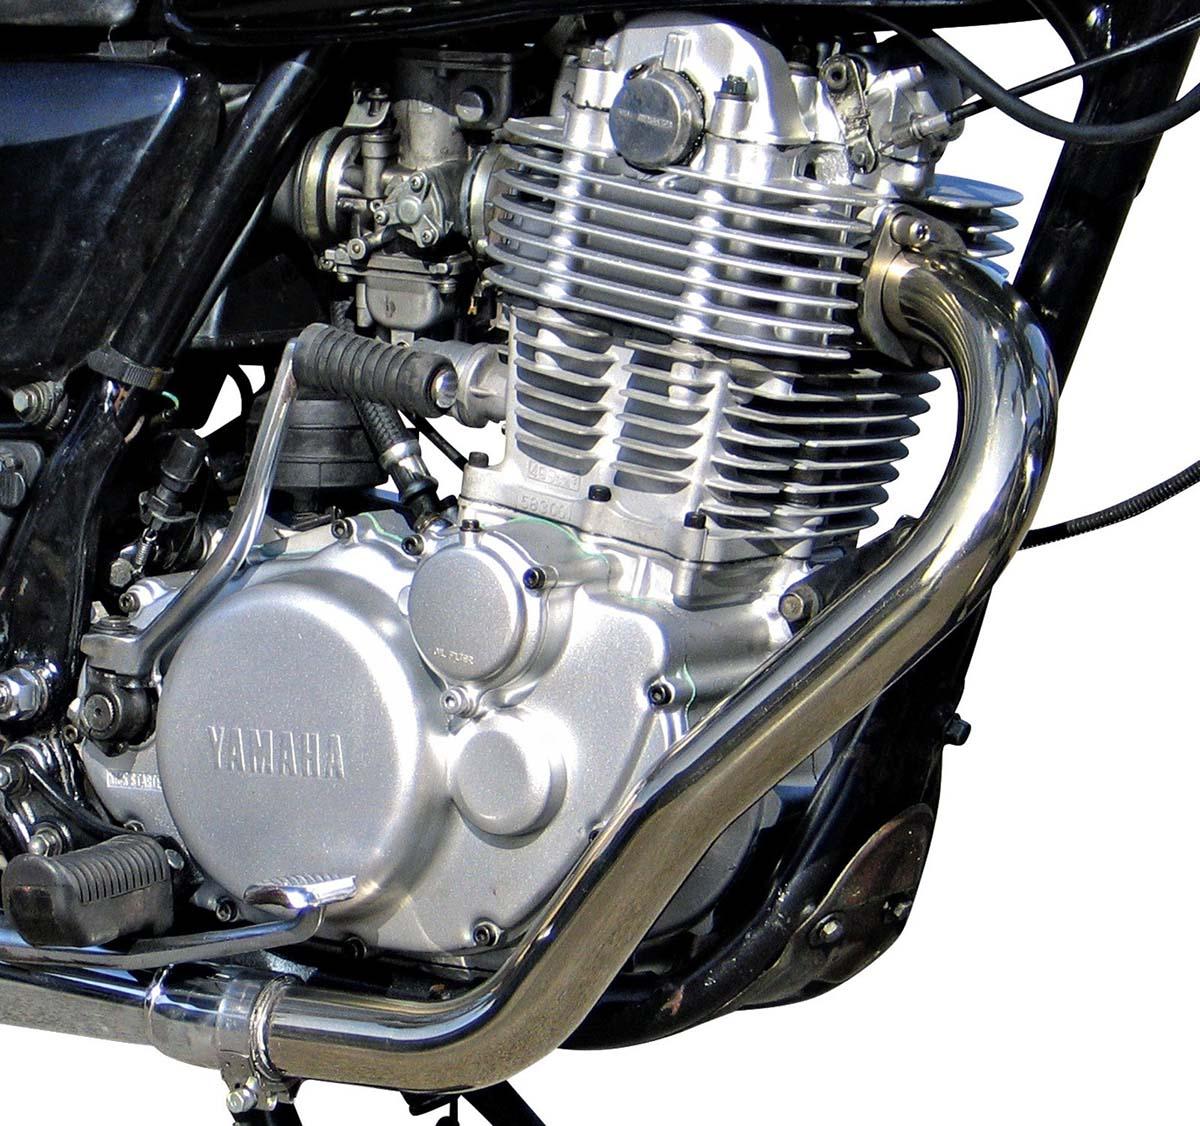 Yamaha SR400 Engine Decompression